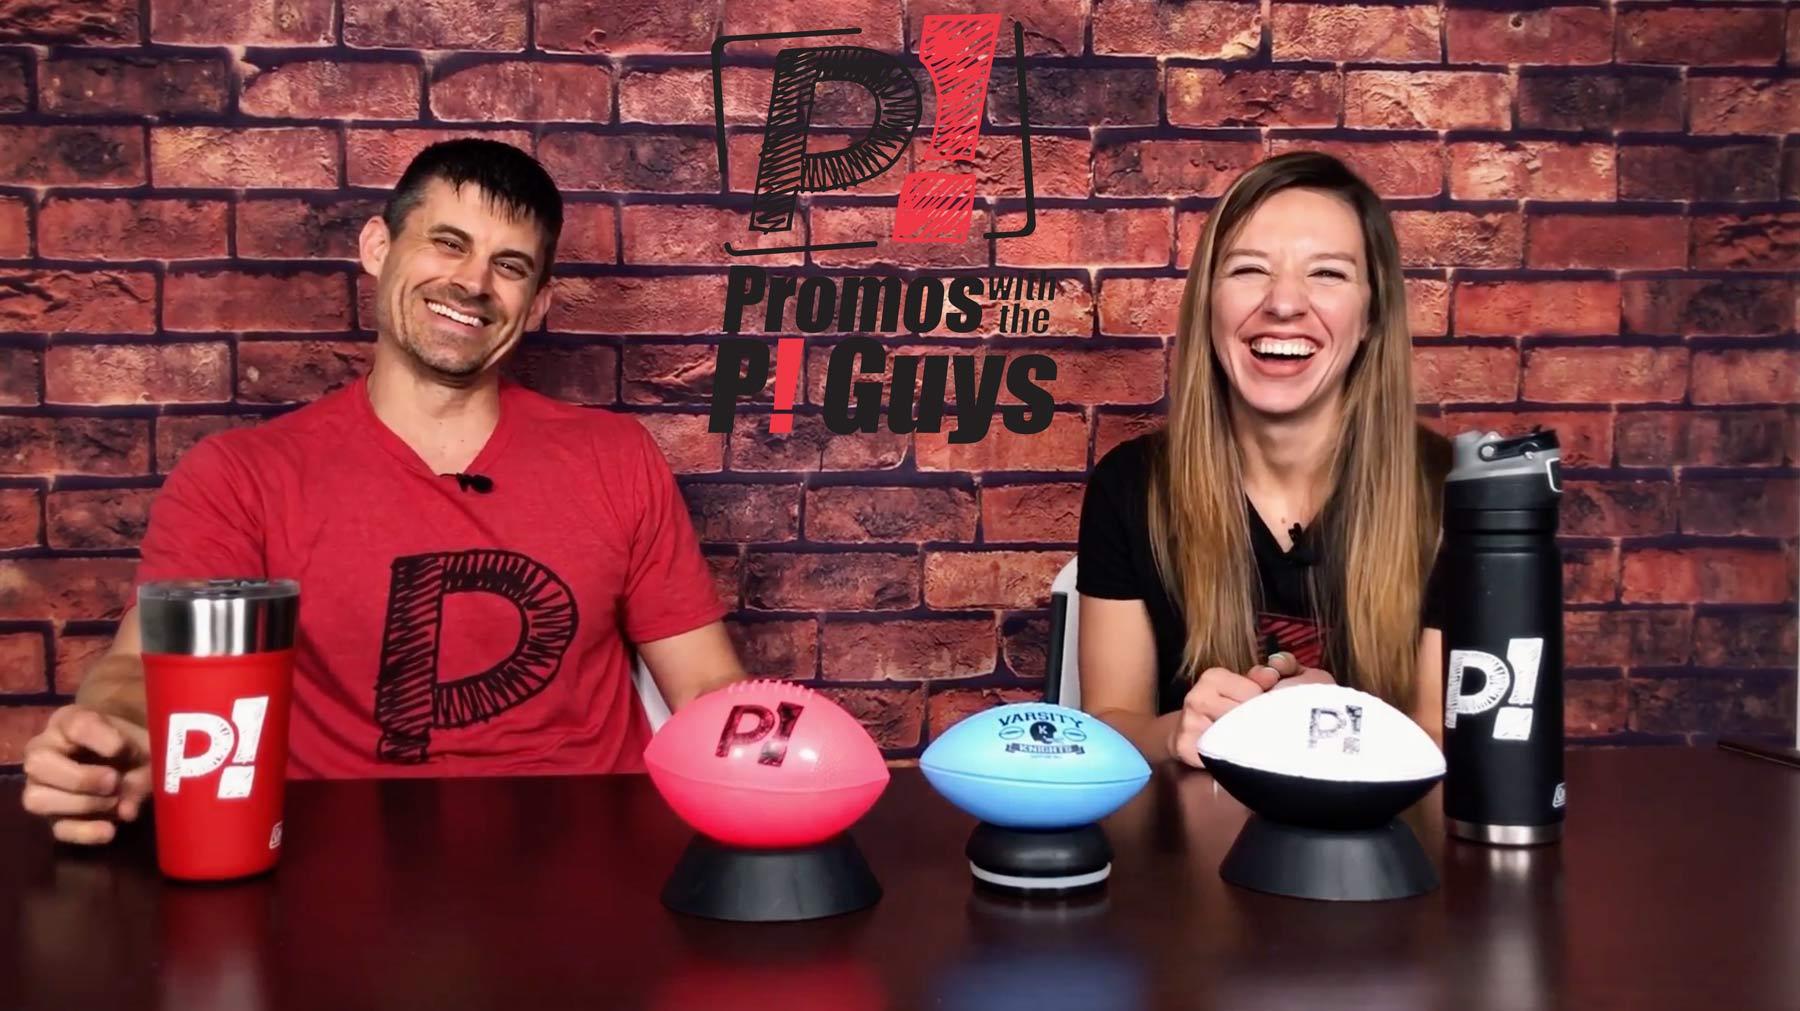 Promos with the P! Guys - Episode 31 - Custom Mini Footballs